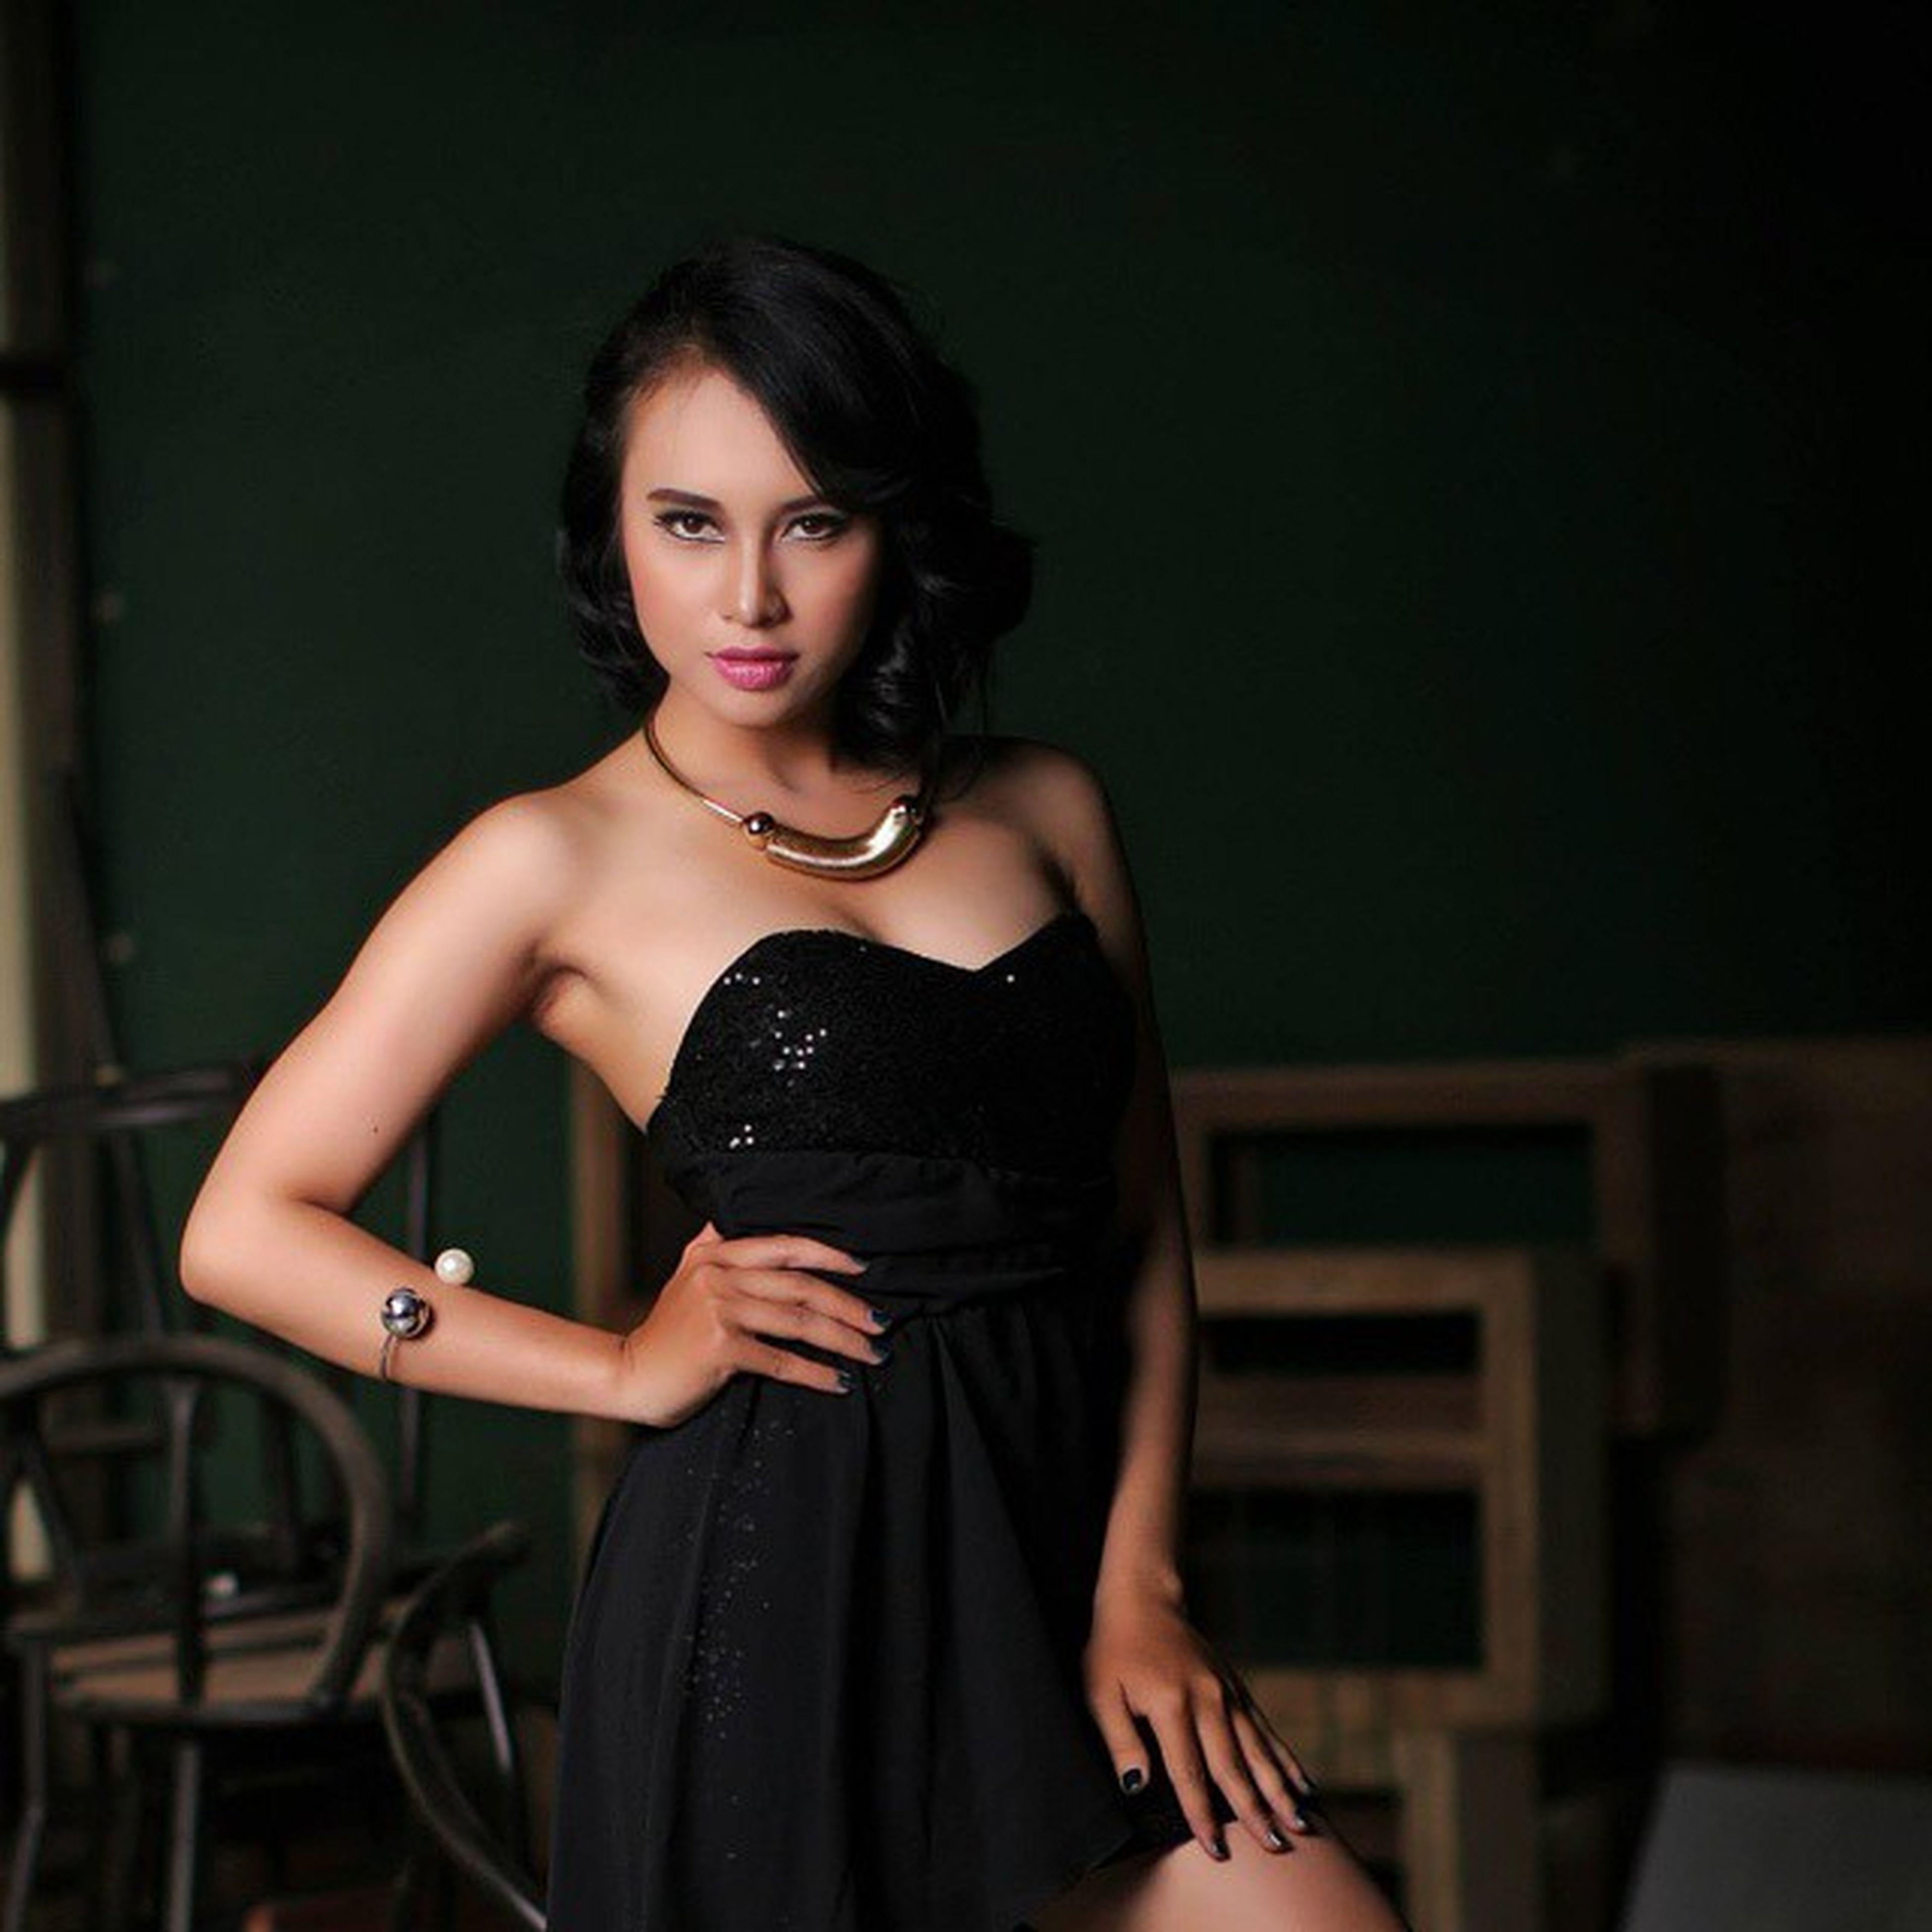 Model : @pritapurnama Make-up artist : @raturegina_mua Wardrobe : herself Squarepic Model Modeling Photoshoot Portrait Fashion Photography Fashion Magazine Mood_photography Bestphotogram_portraits Explore Likeforlike Like4likes Instagoodnight Beauty Model_look